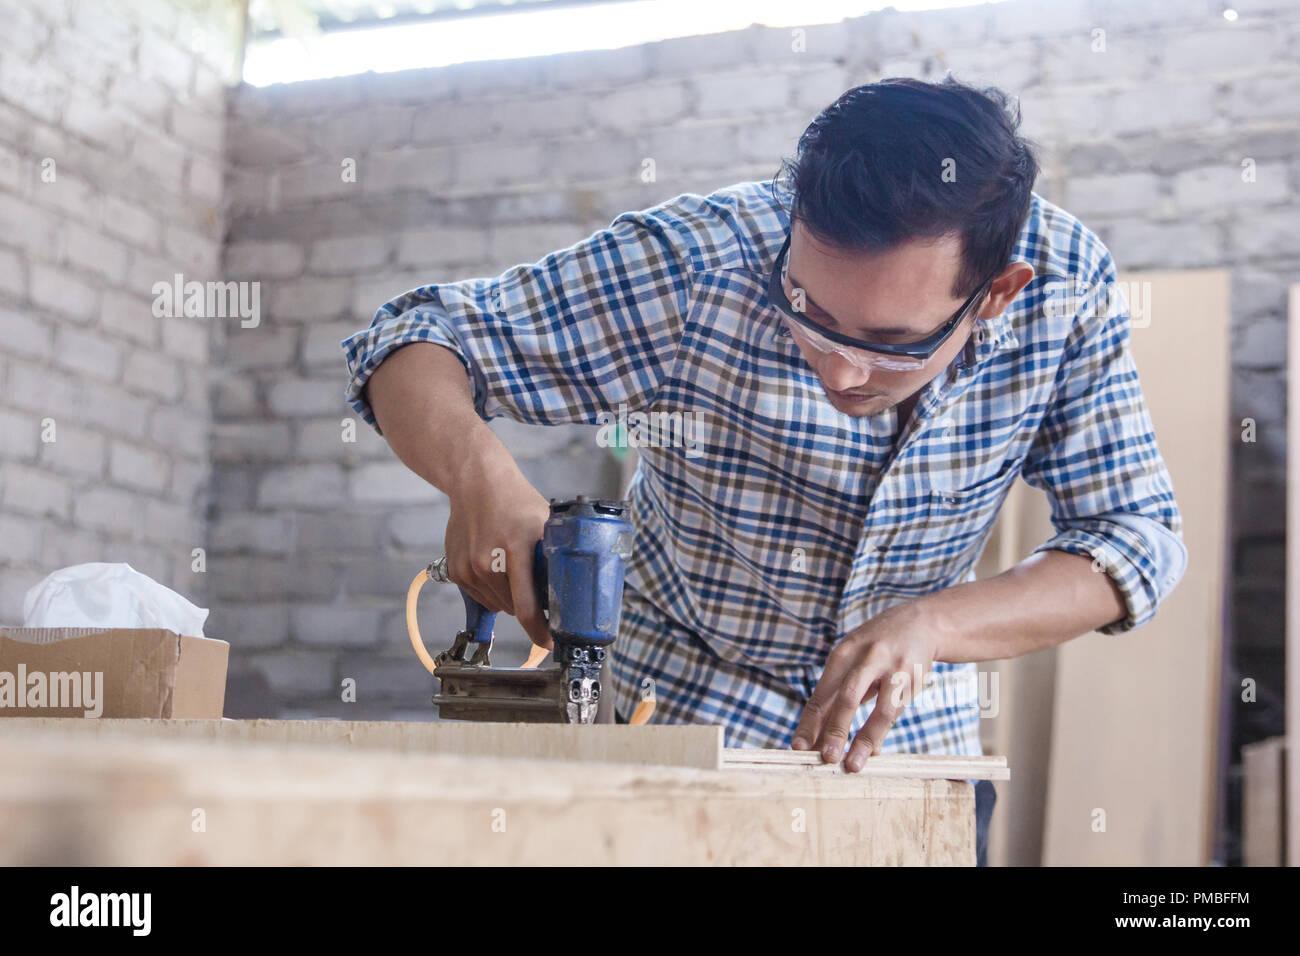 worker at carpenter workspace installing nail using pneumatic na Stock Photo